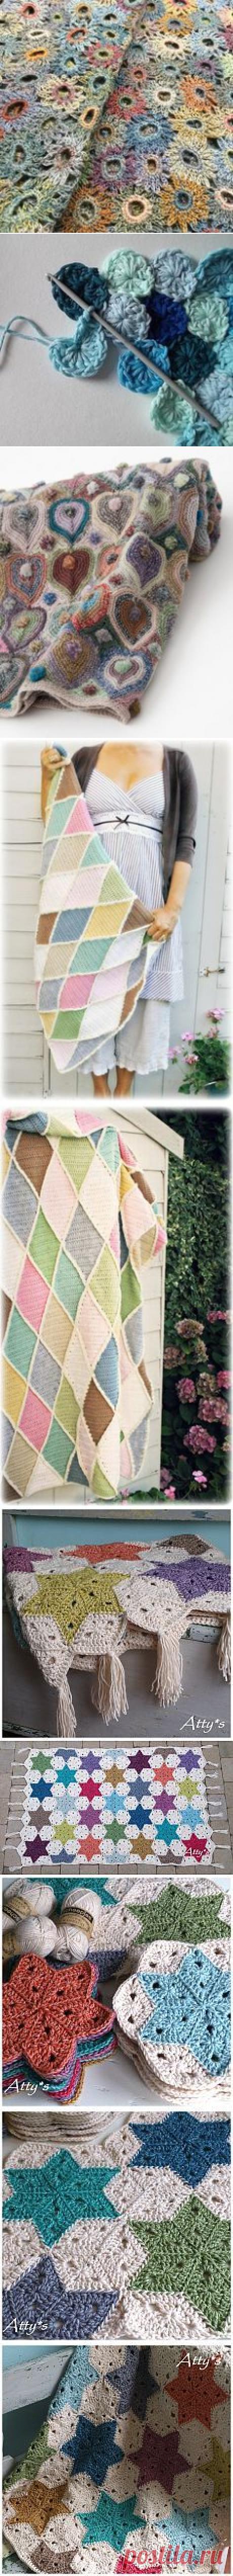 crochet | Crocheting